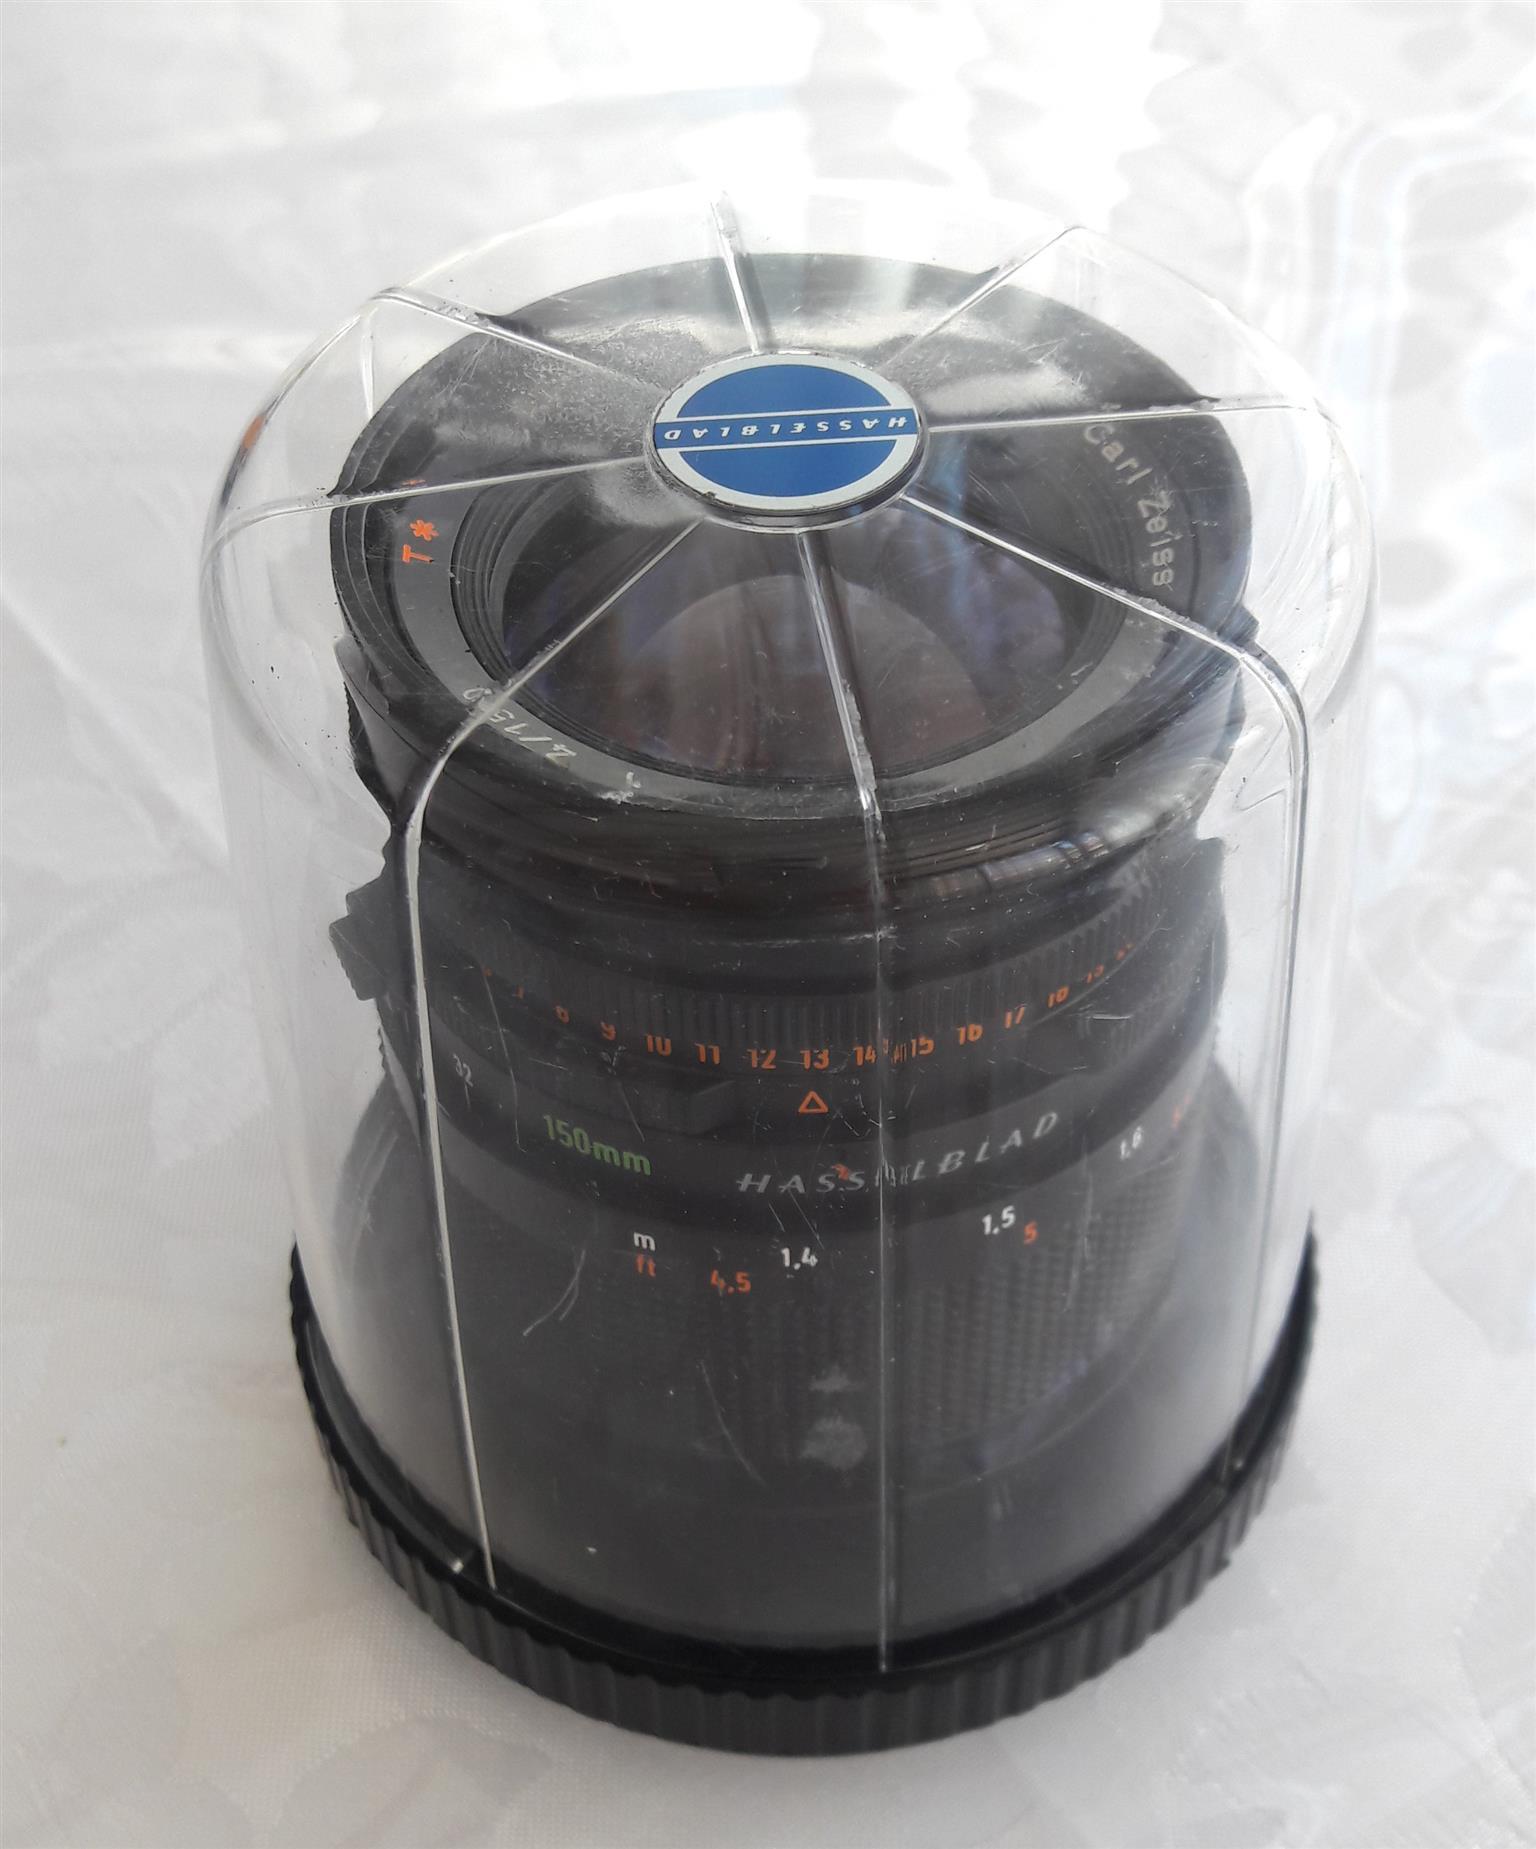 Hasselblad 500 C/M; standard 80mm lens ; A12 film back. Format 120/6x6cm series.